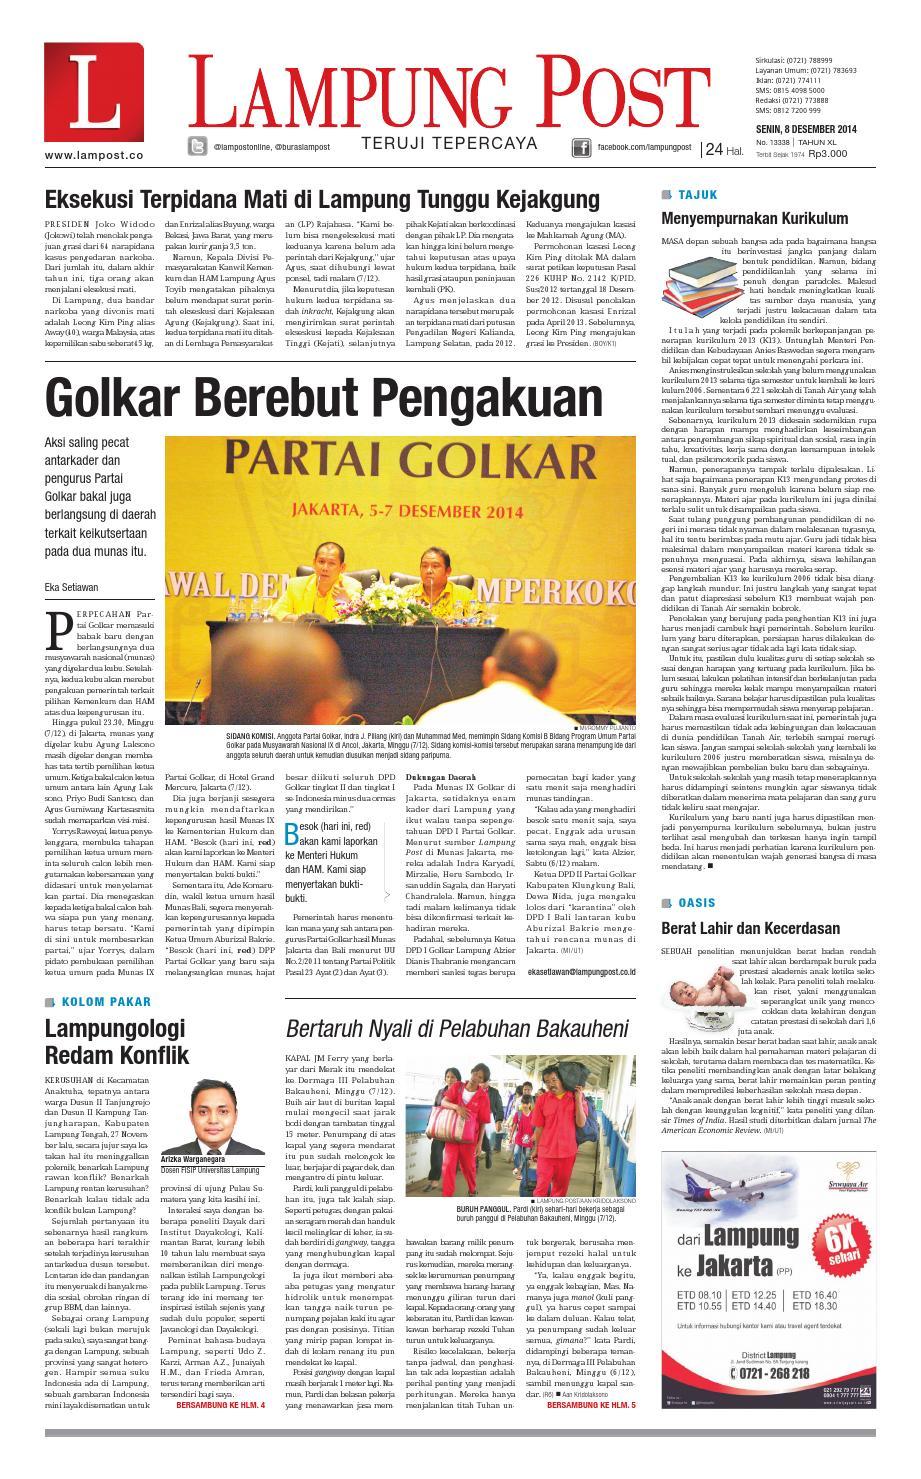 Lampung Post Senin 8 Desember 2014 By Issuu Produk Ukm Bumn Box Hantaran Pengantin Bio Art